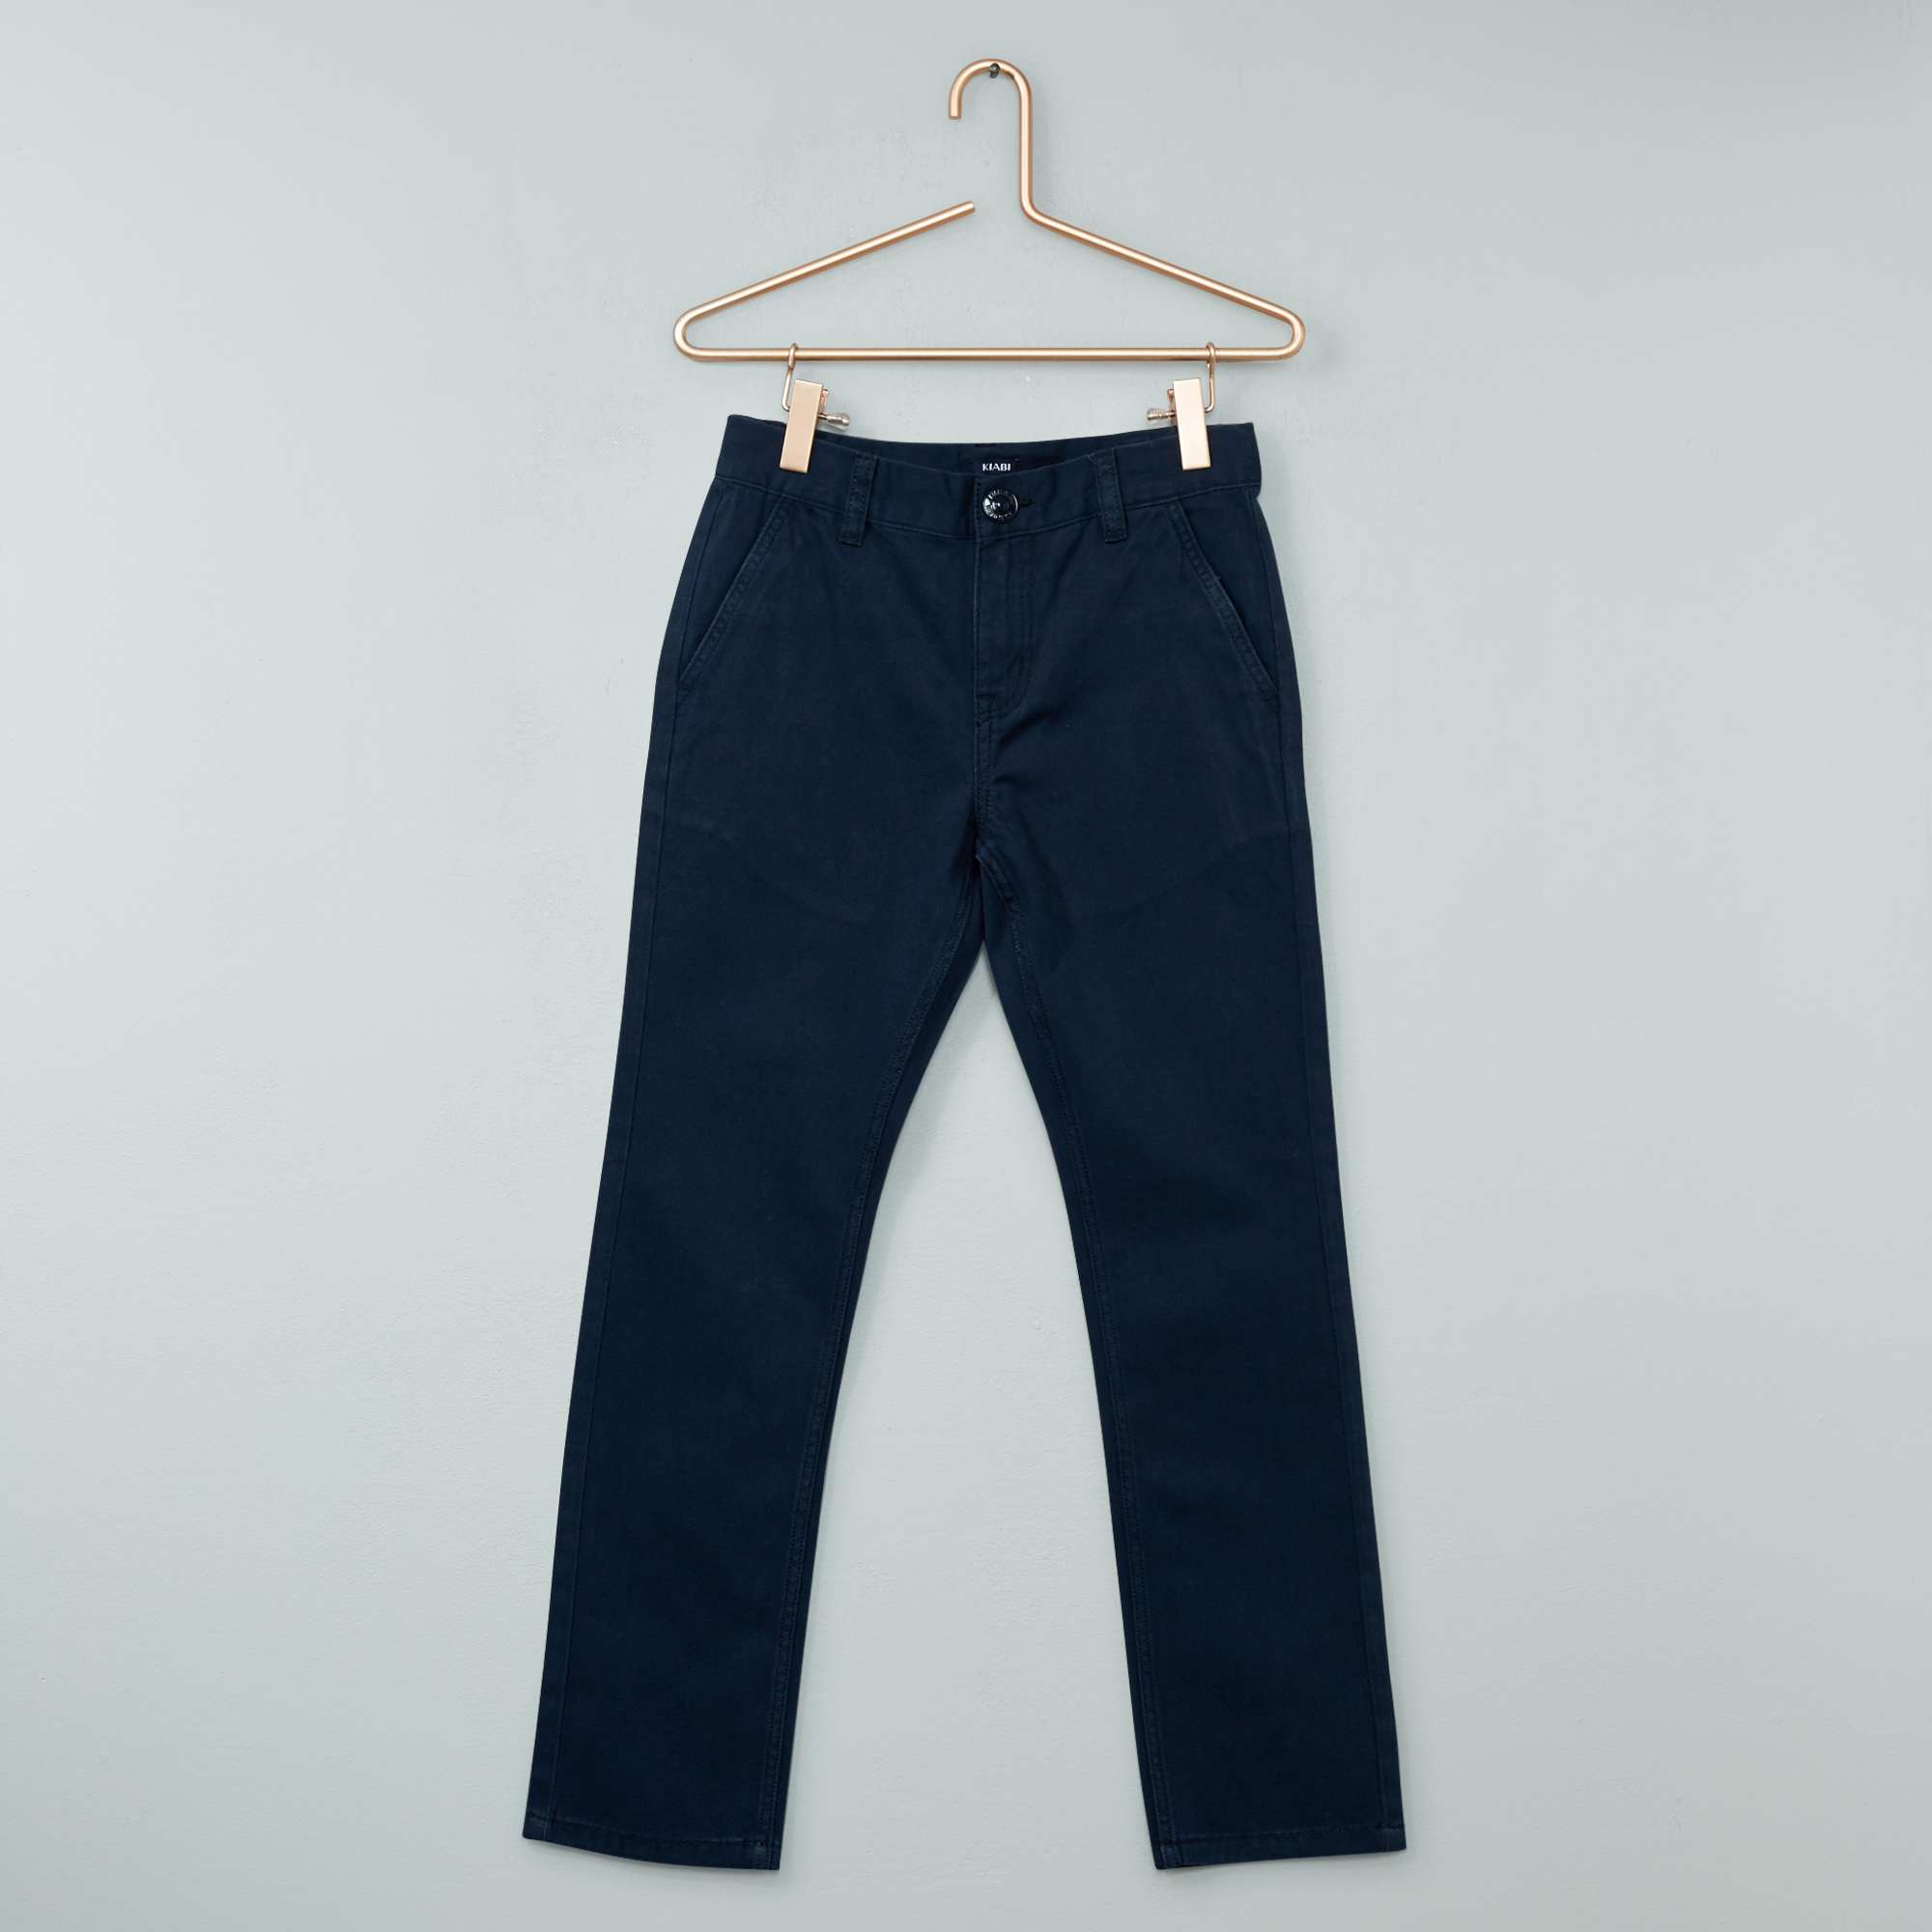 pantalon chino en twill gar on bleu marine kiabi 8 00. Black Bedroom Furniture Sets. Home Design Ideas